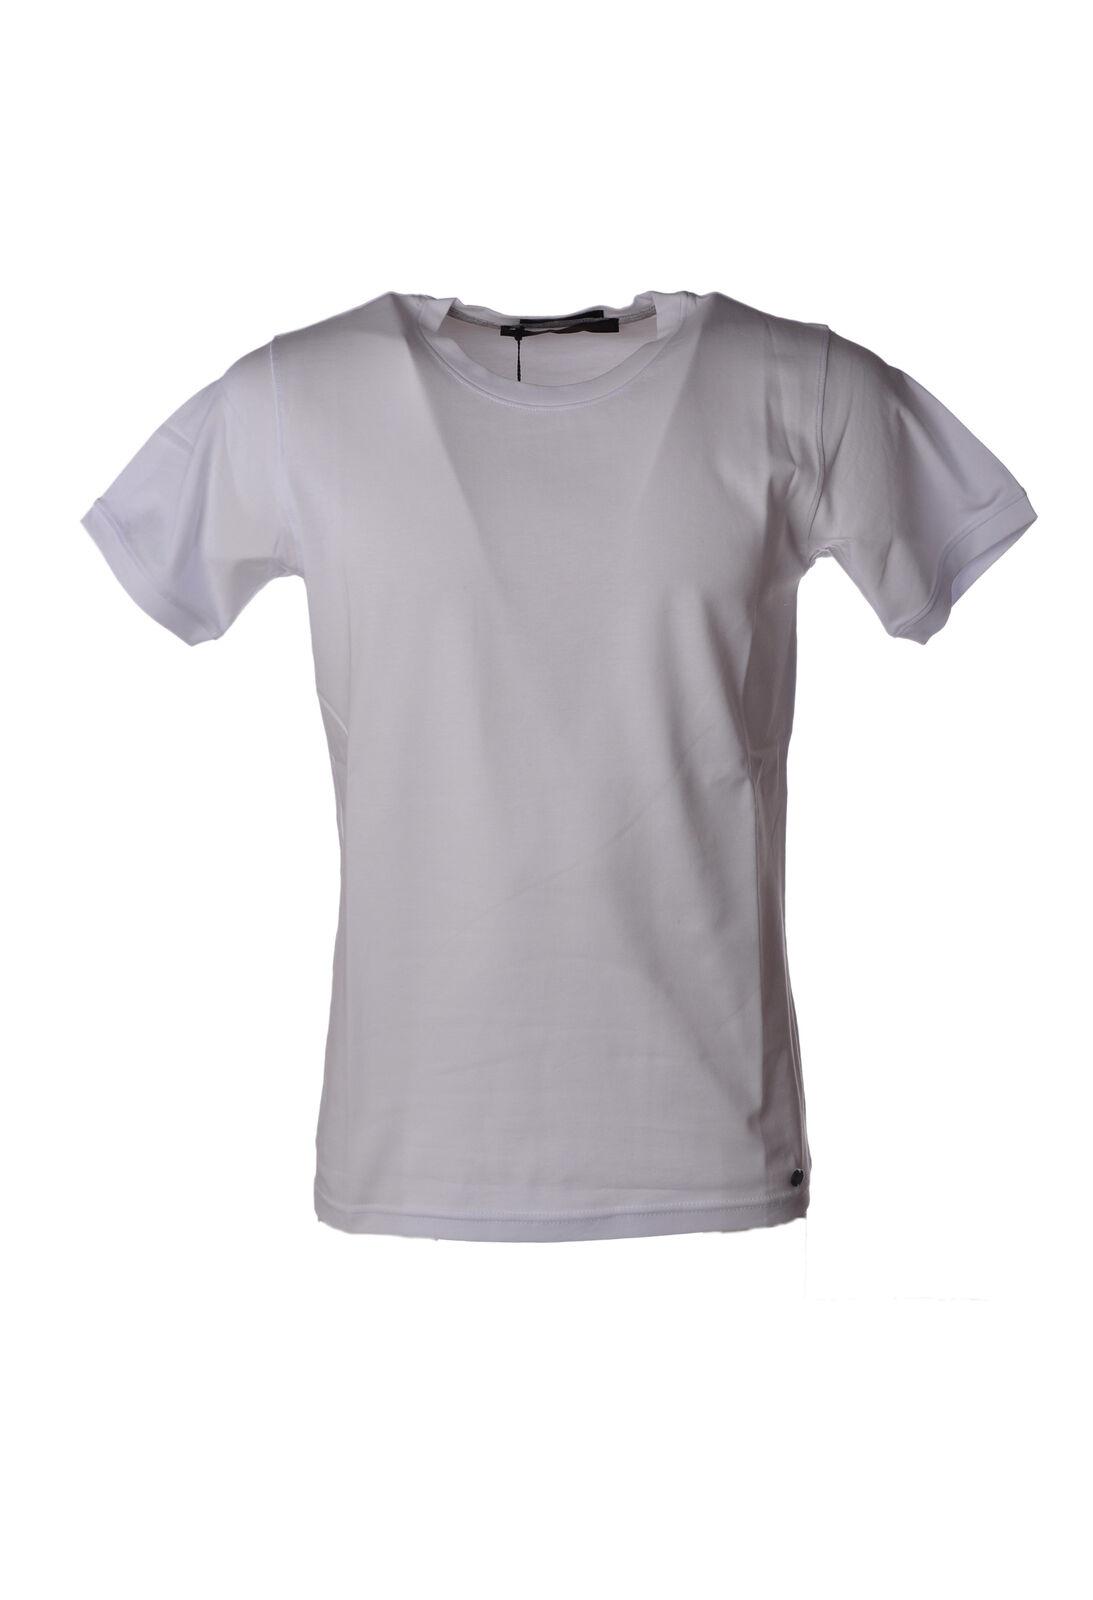 Laboratori Italiani - Topwear-T-shirts - Mann - white - 5018405C184323